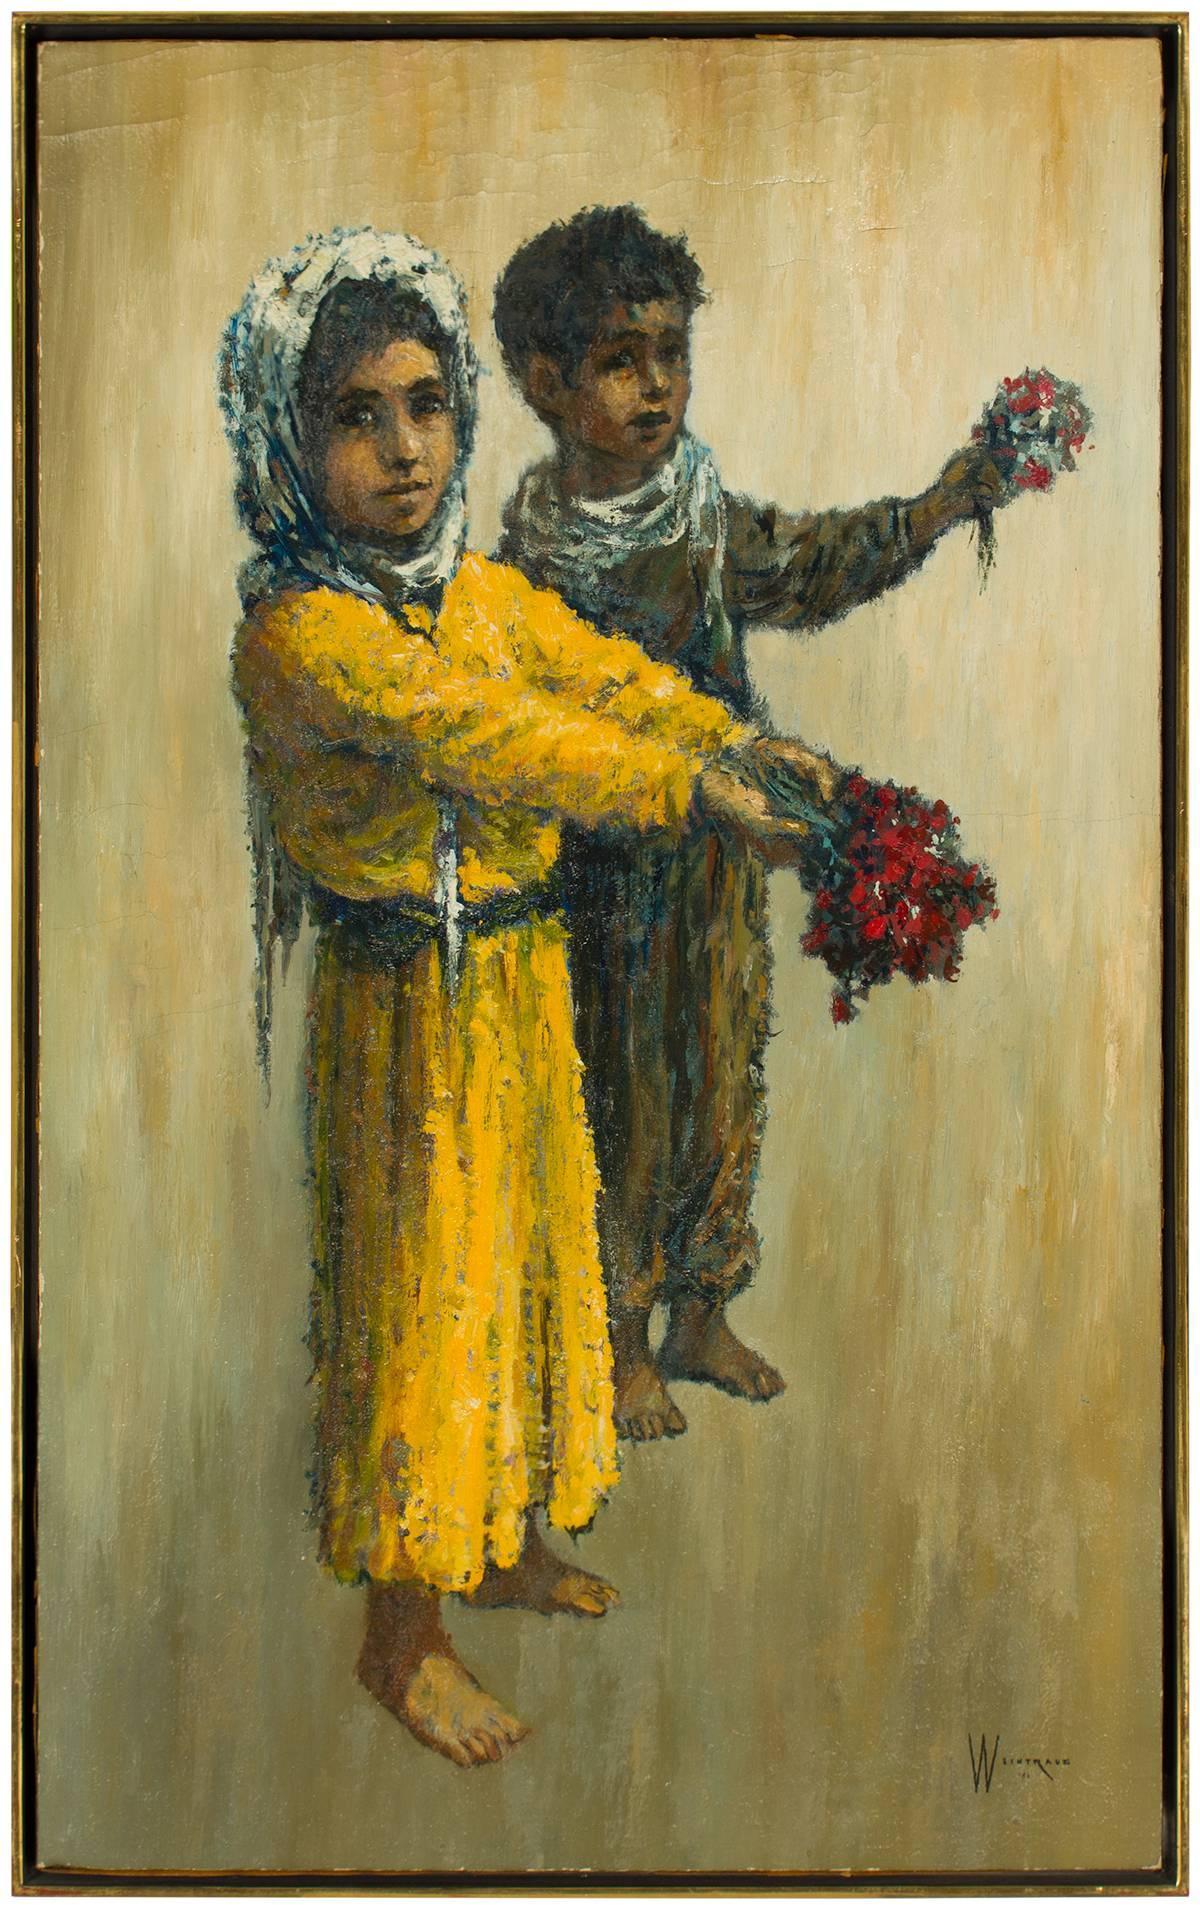 Barefoot Children and Flowers, Modern Mid-Century Israeli Painting